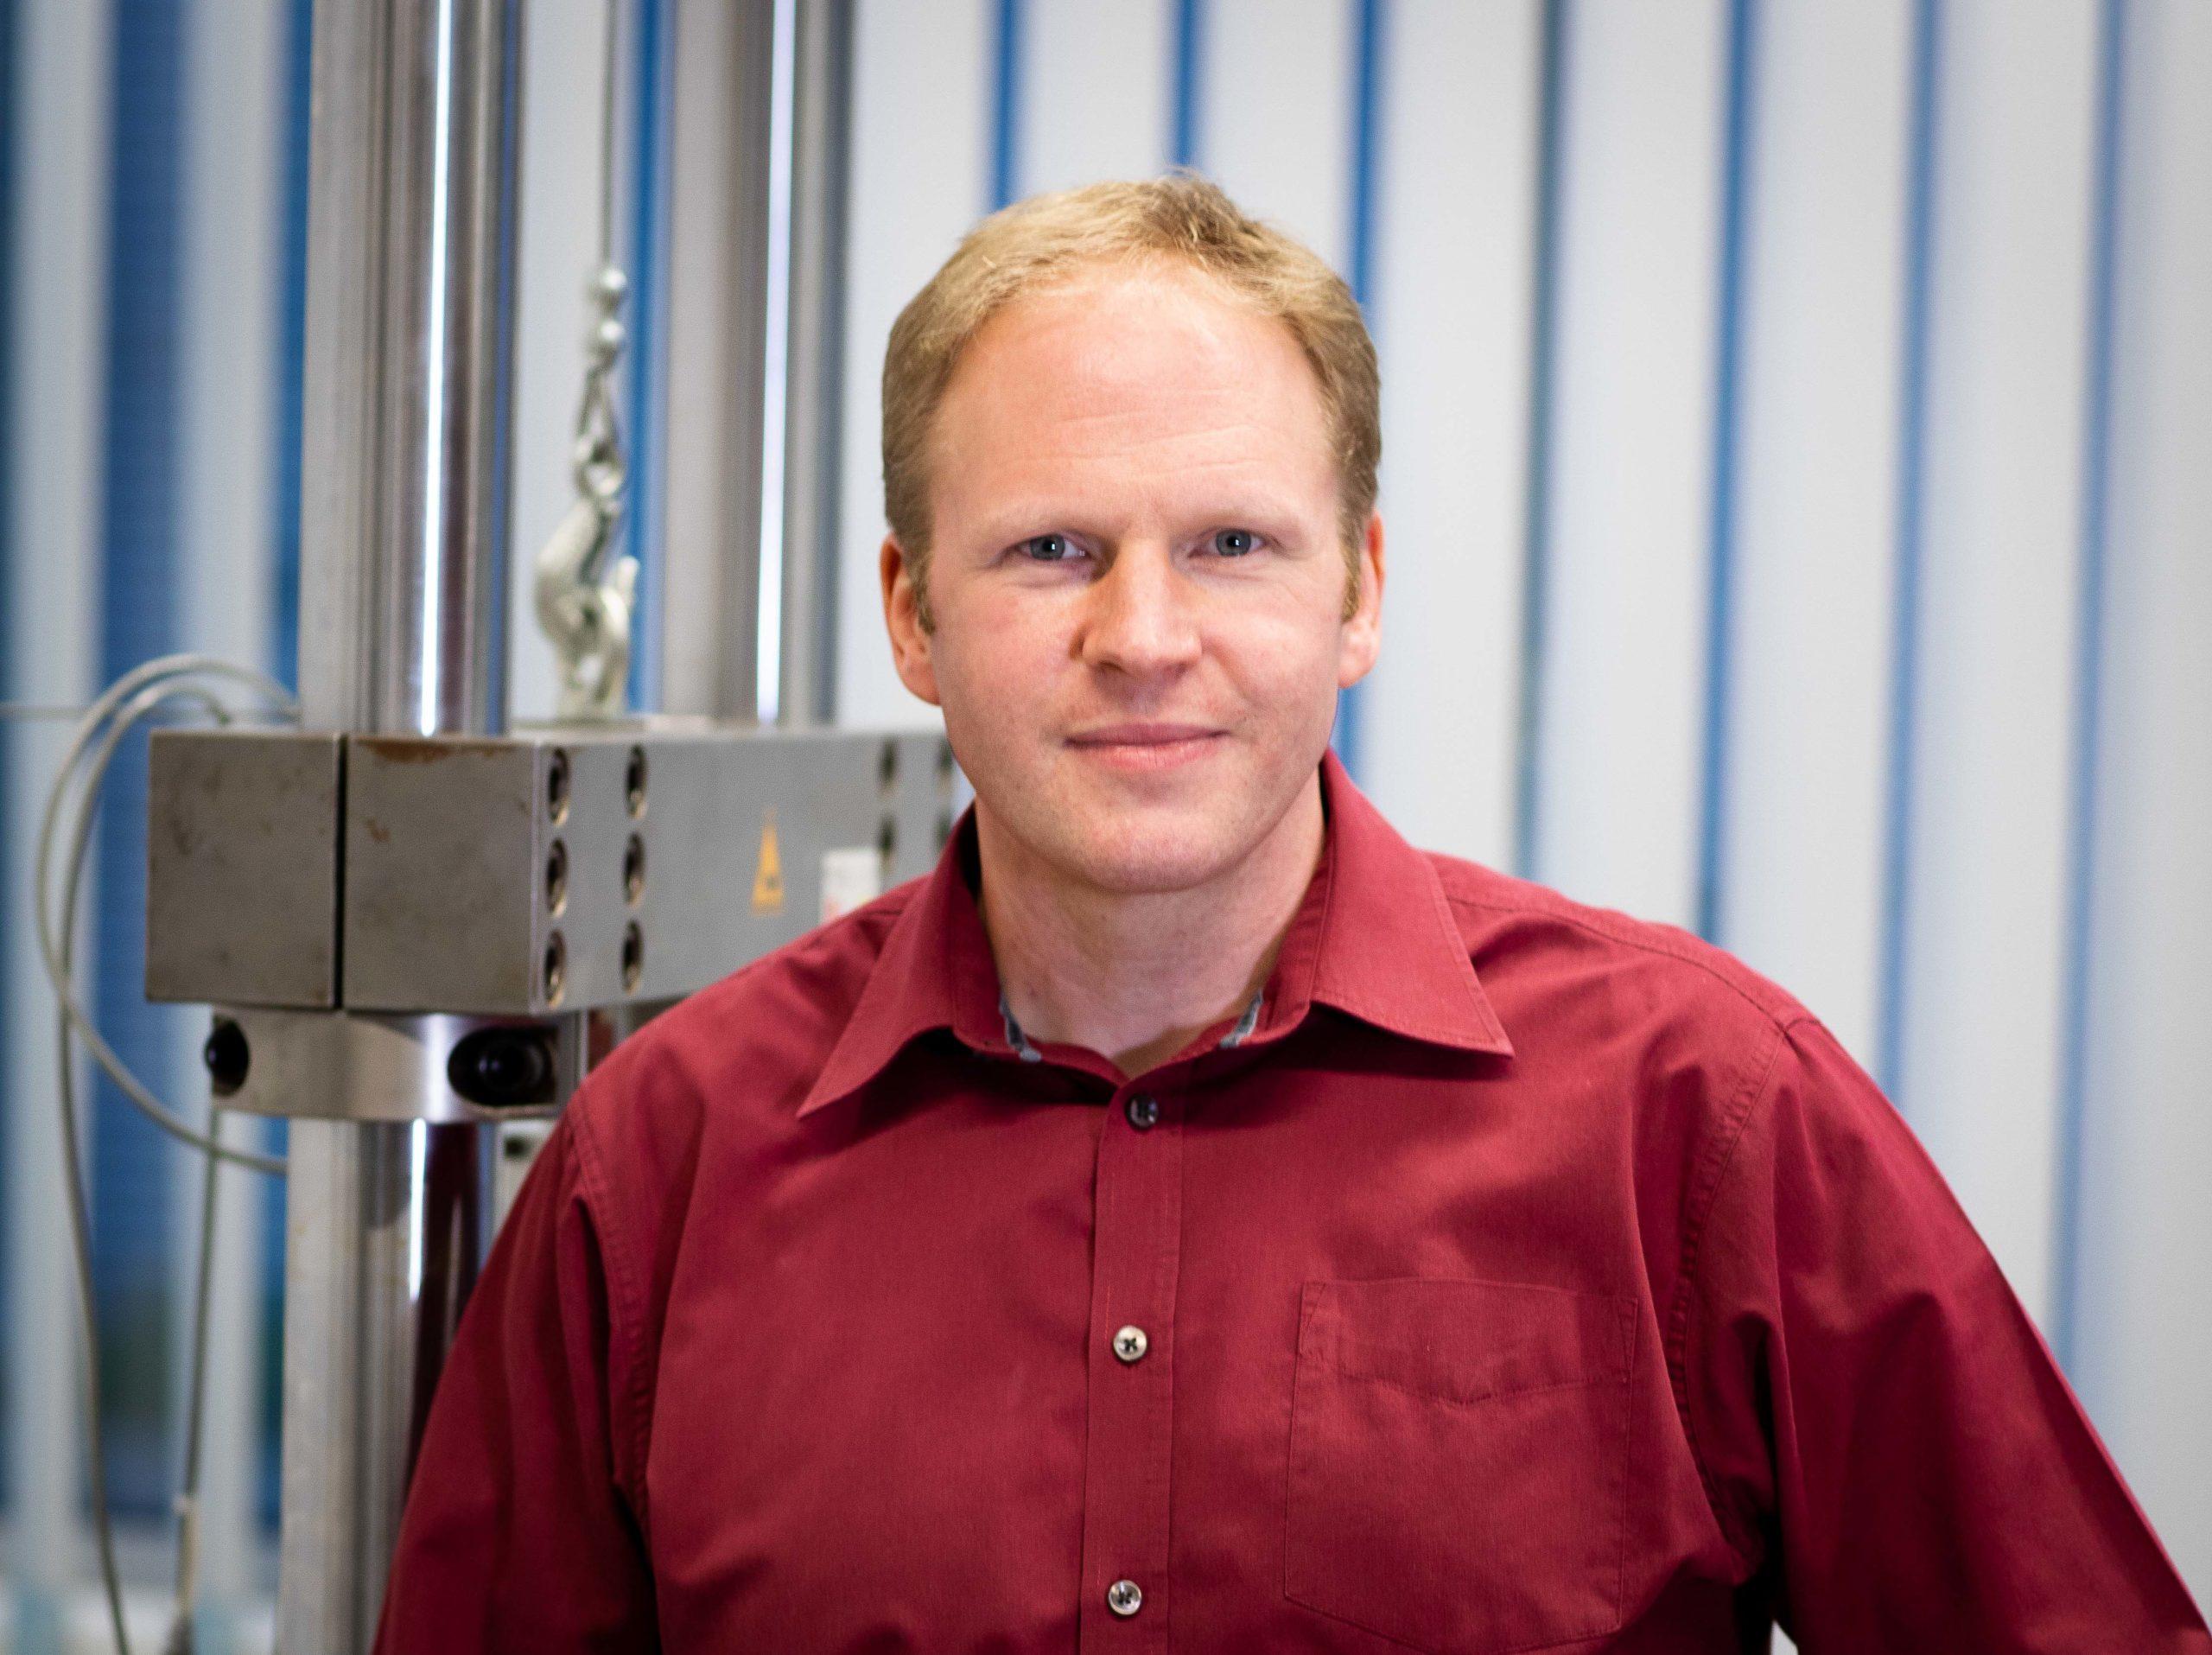 Dipl.-Ing. Alexander Brückner | Polymer Engineering Bayreuth